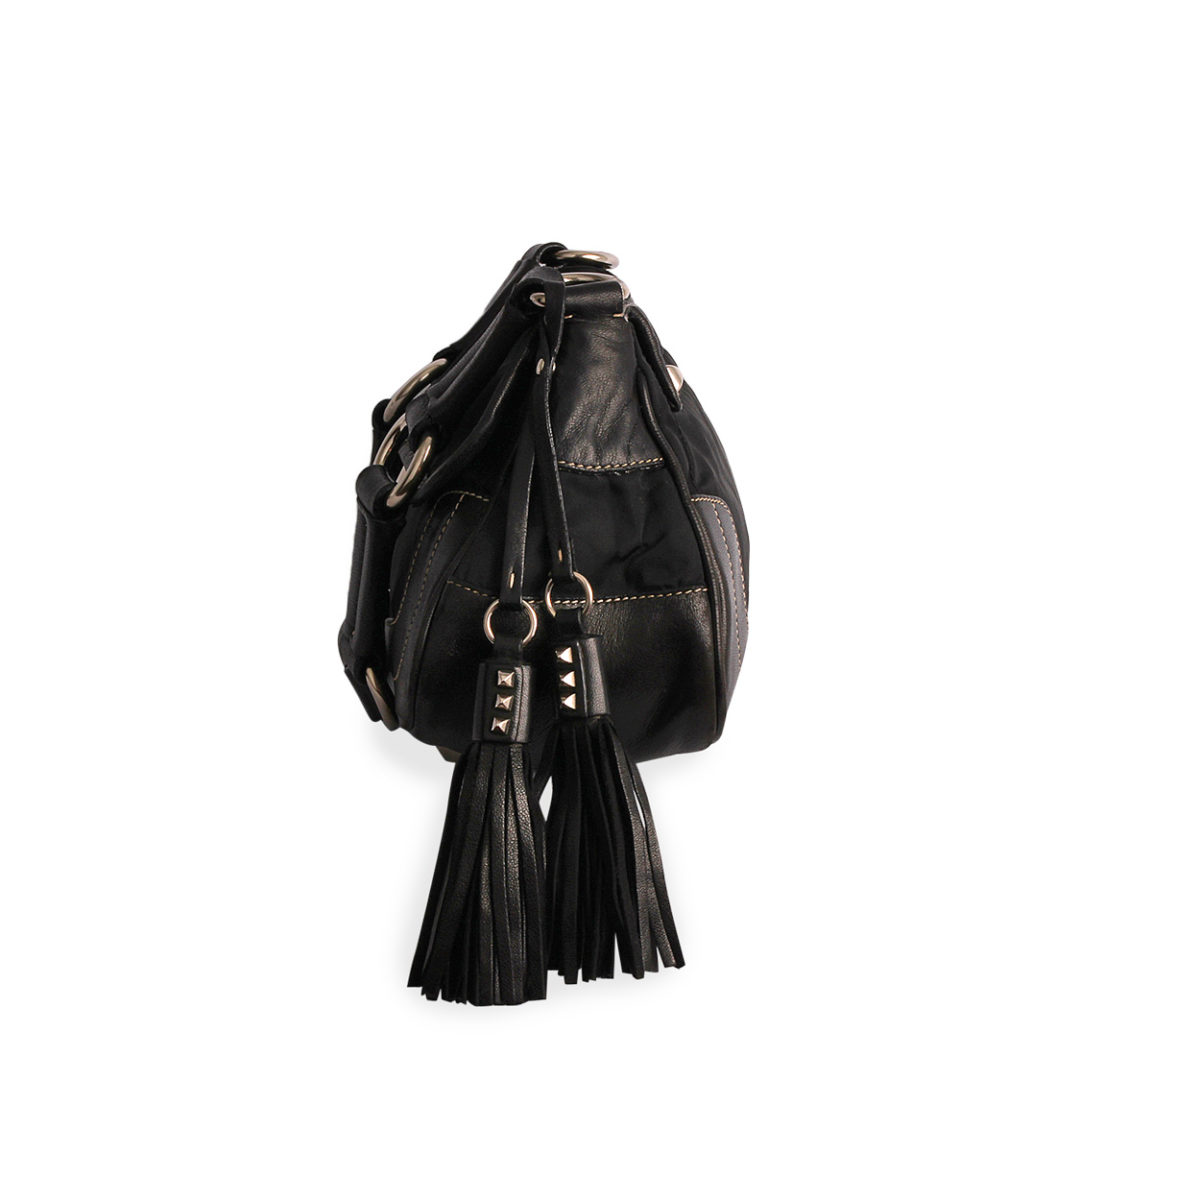 c21817a460 PRADA Nylon Tessuto Tassel Shoulder Bag Black | Luxity